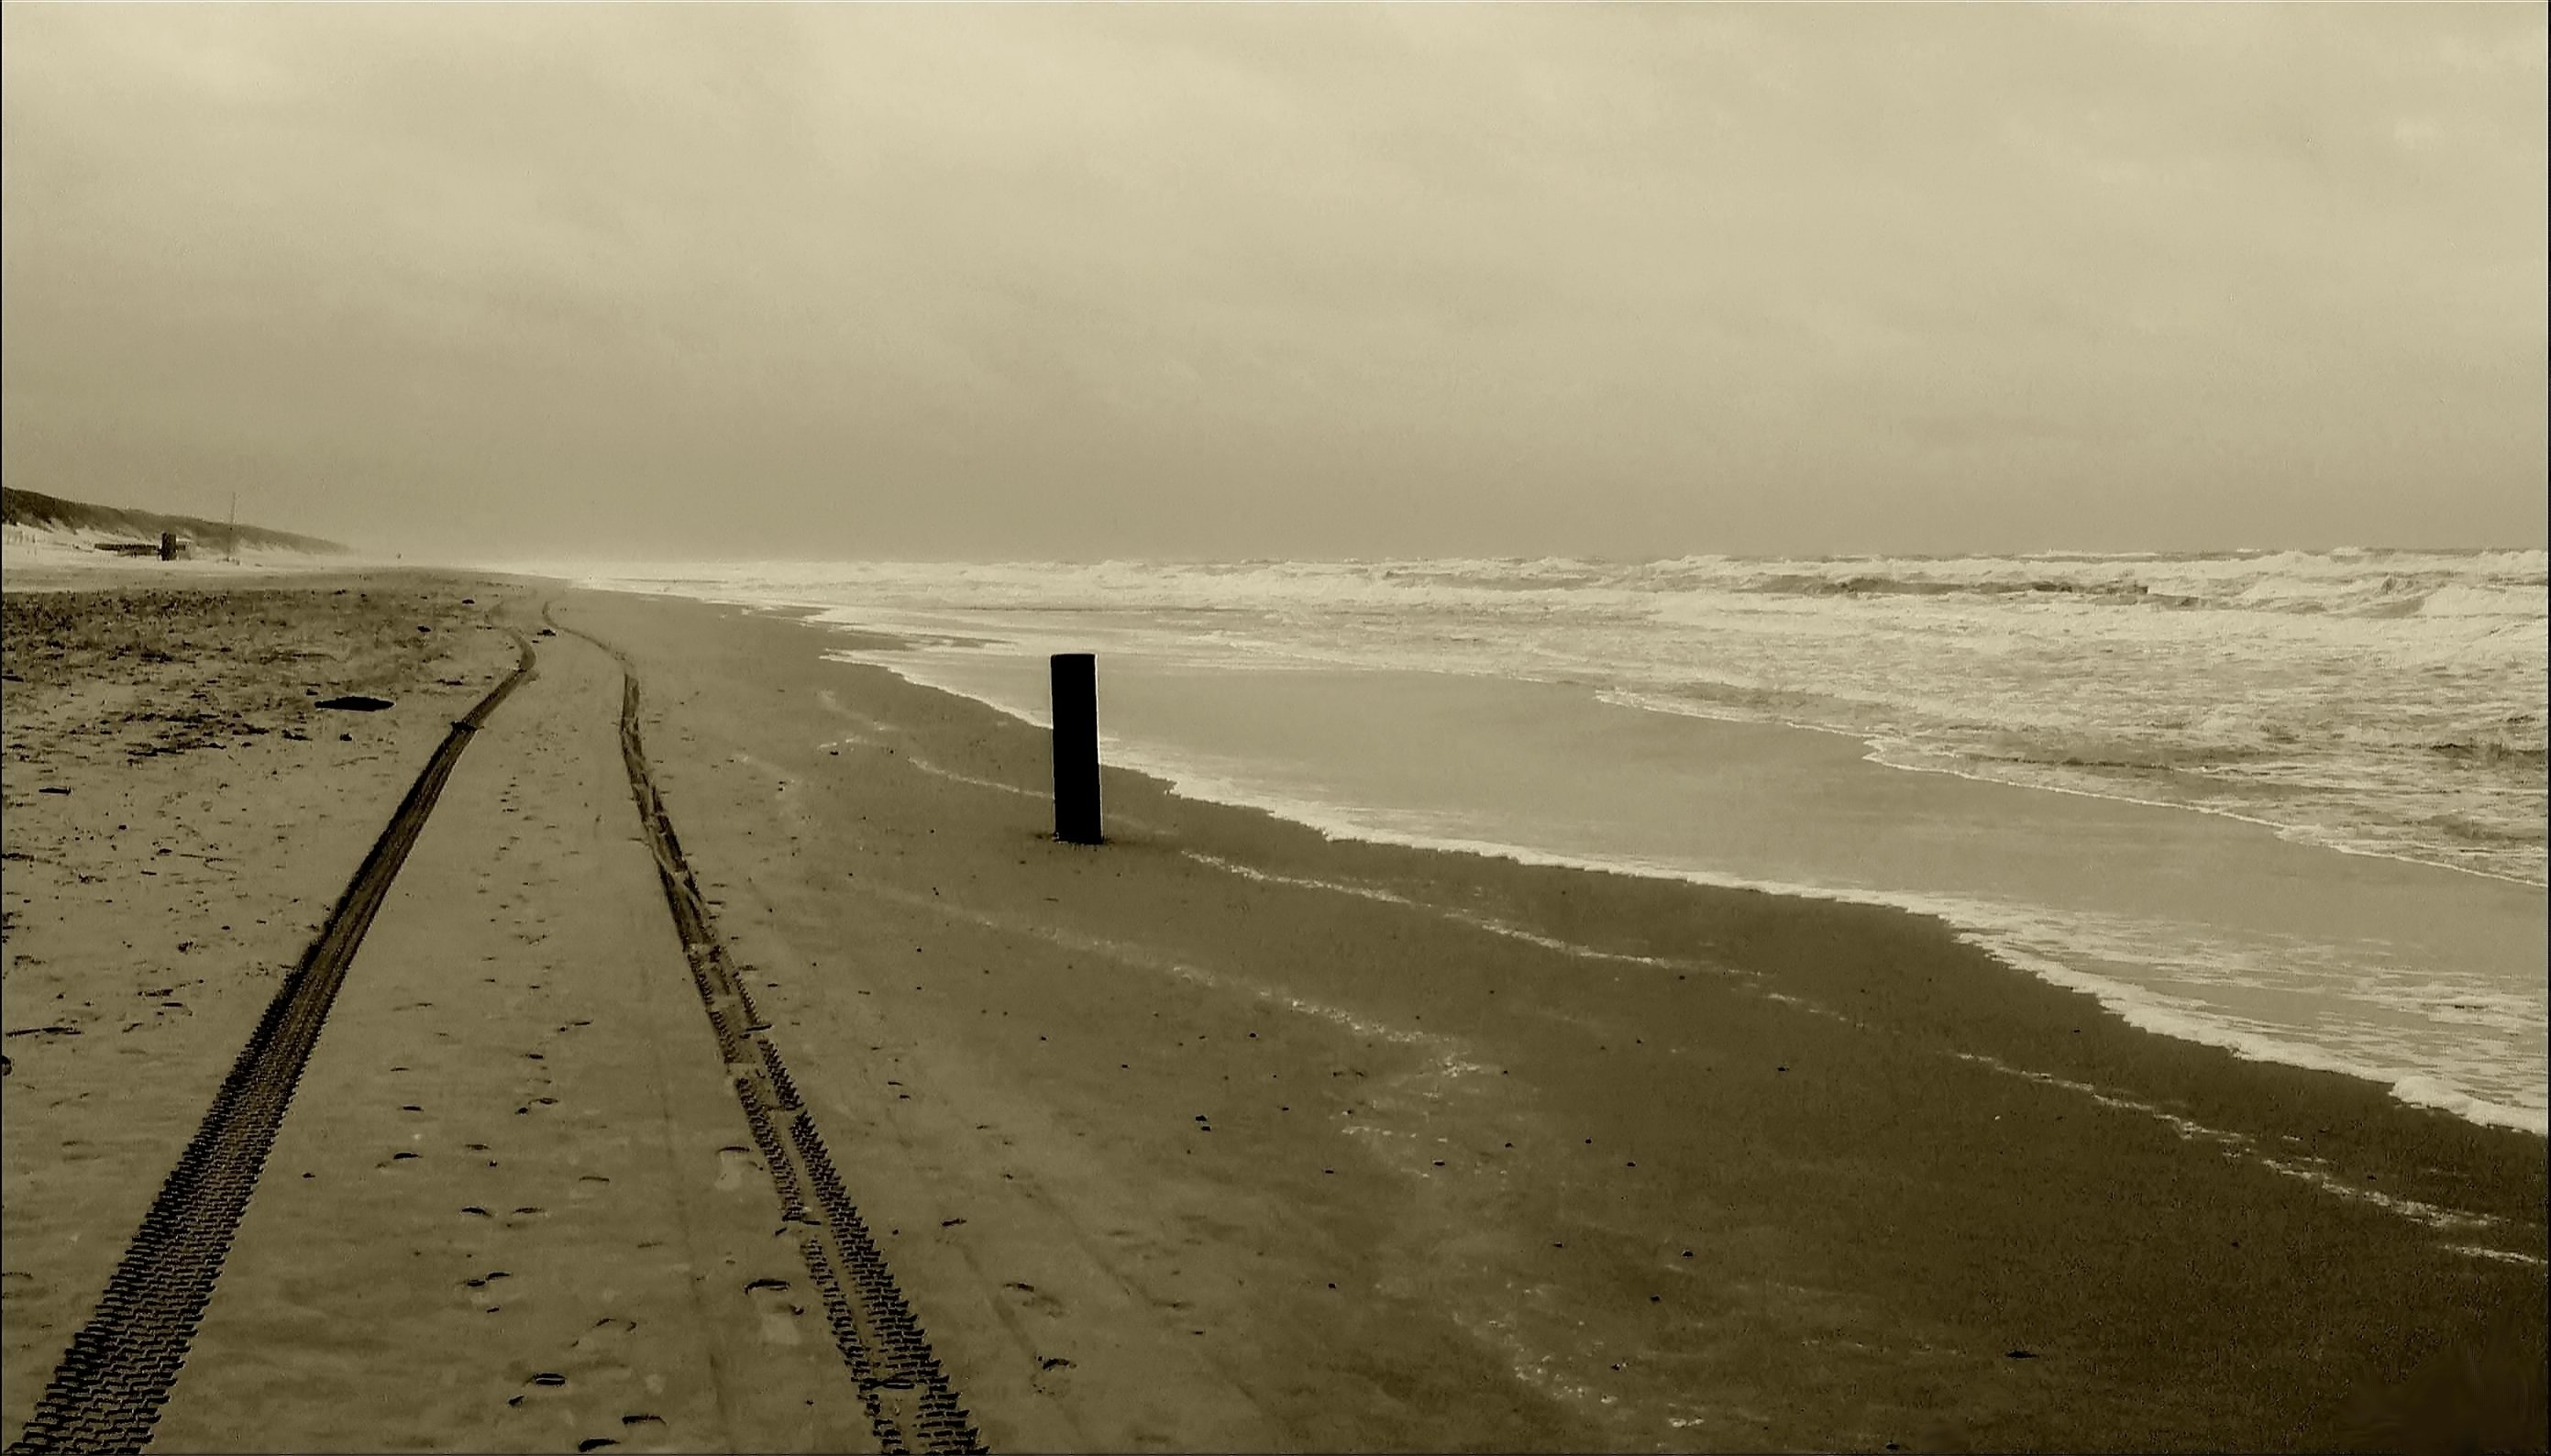 Empty Beach, Beach, Empty, Nature, River, HQ Photo